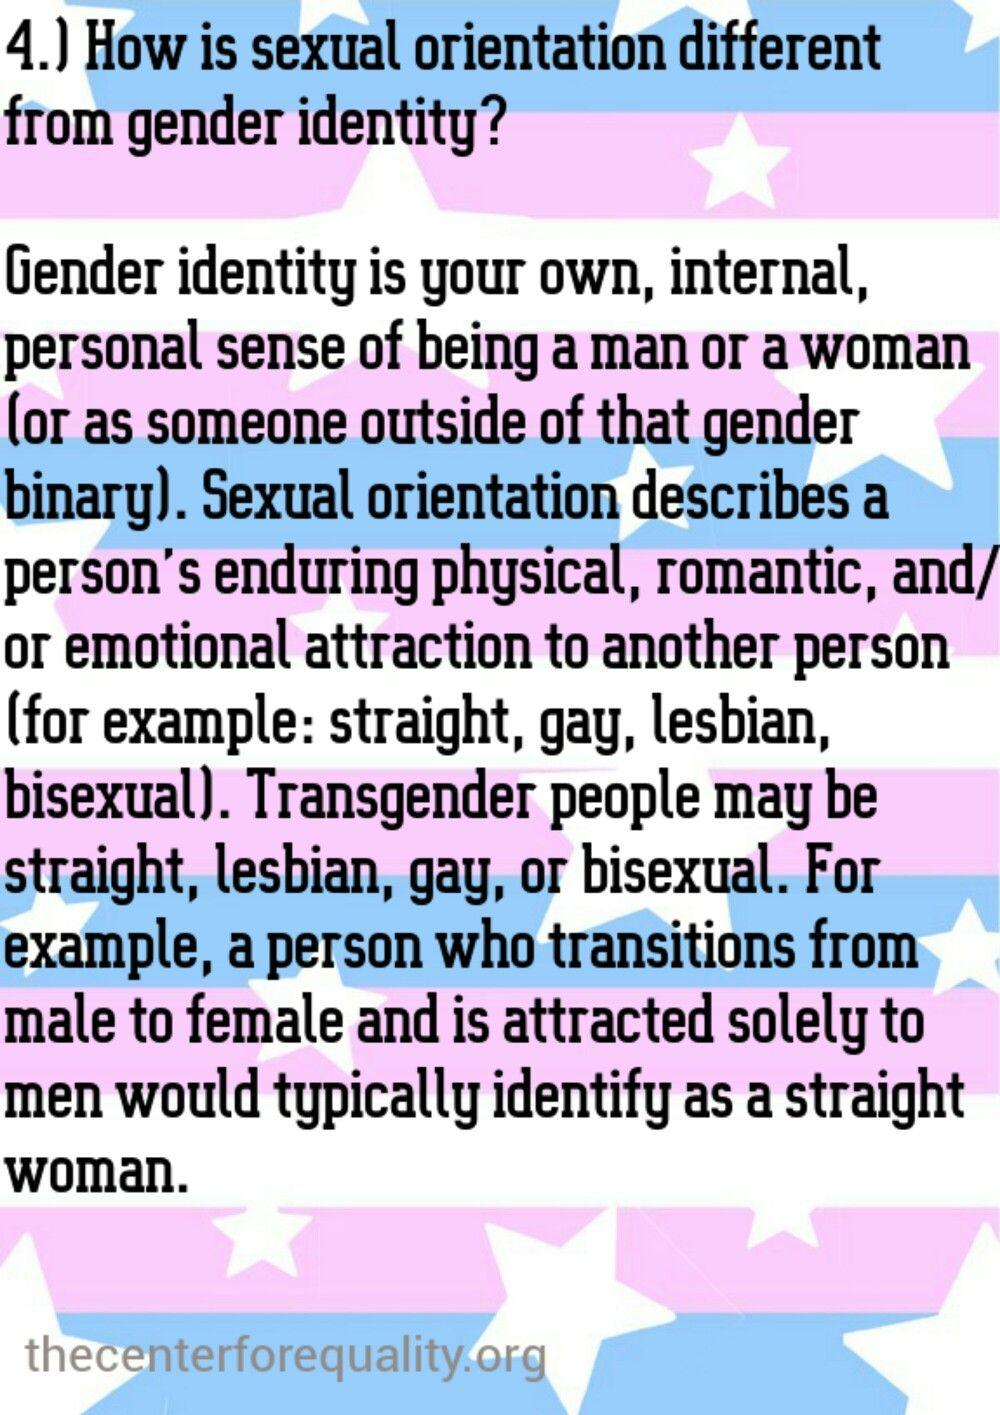 Different sexual orientation